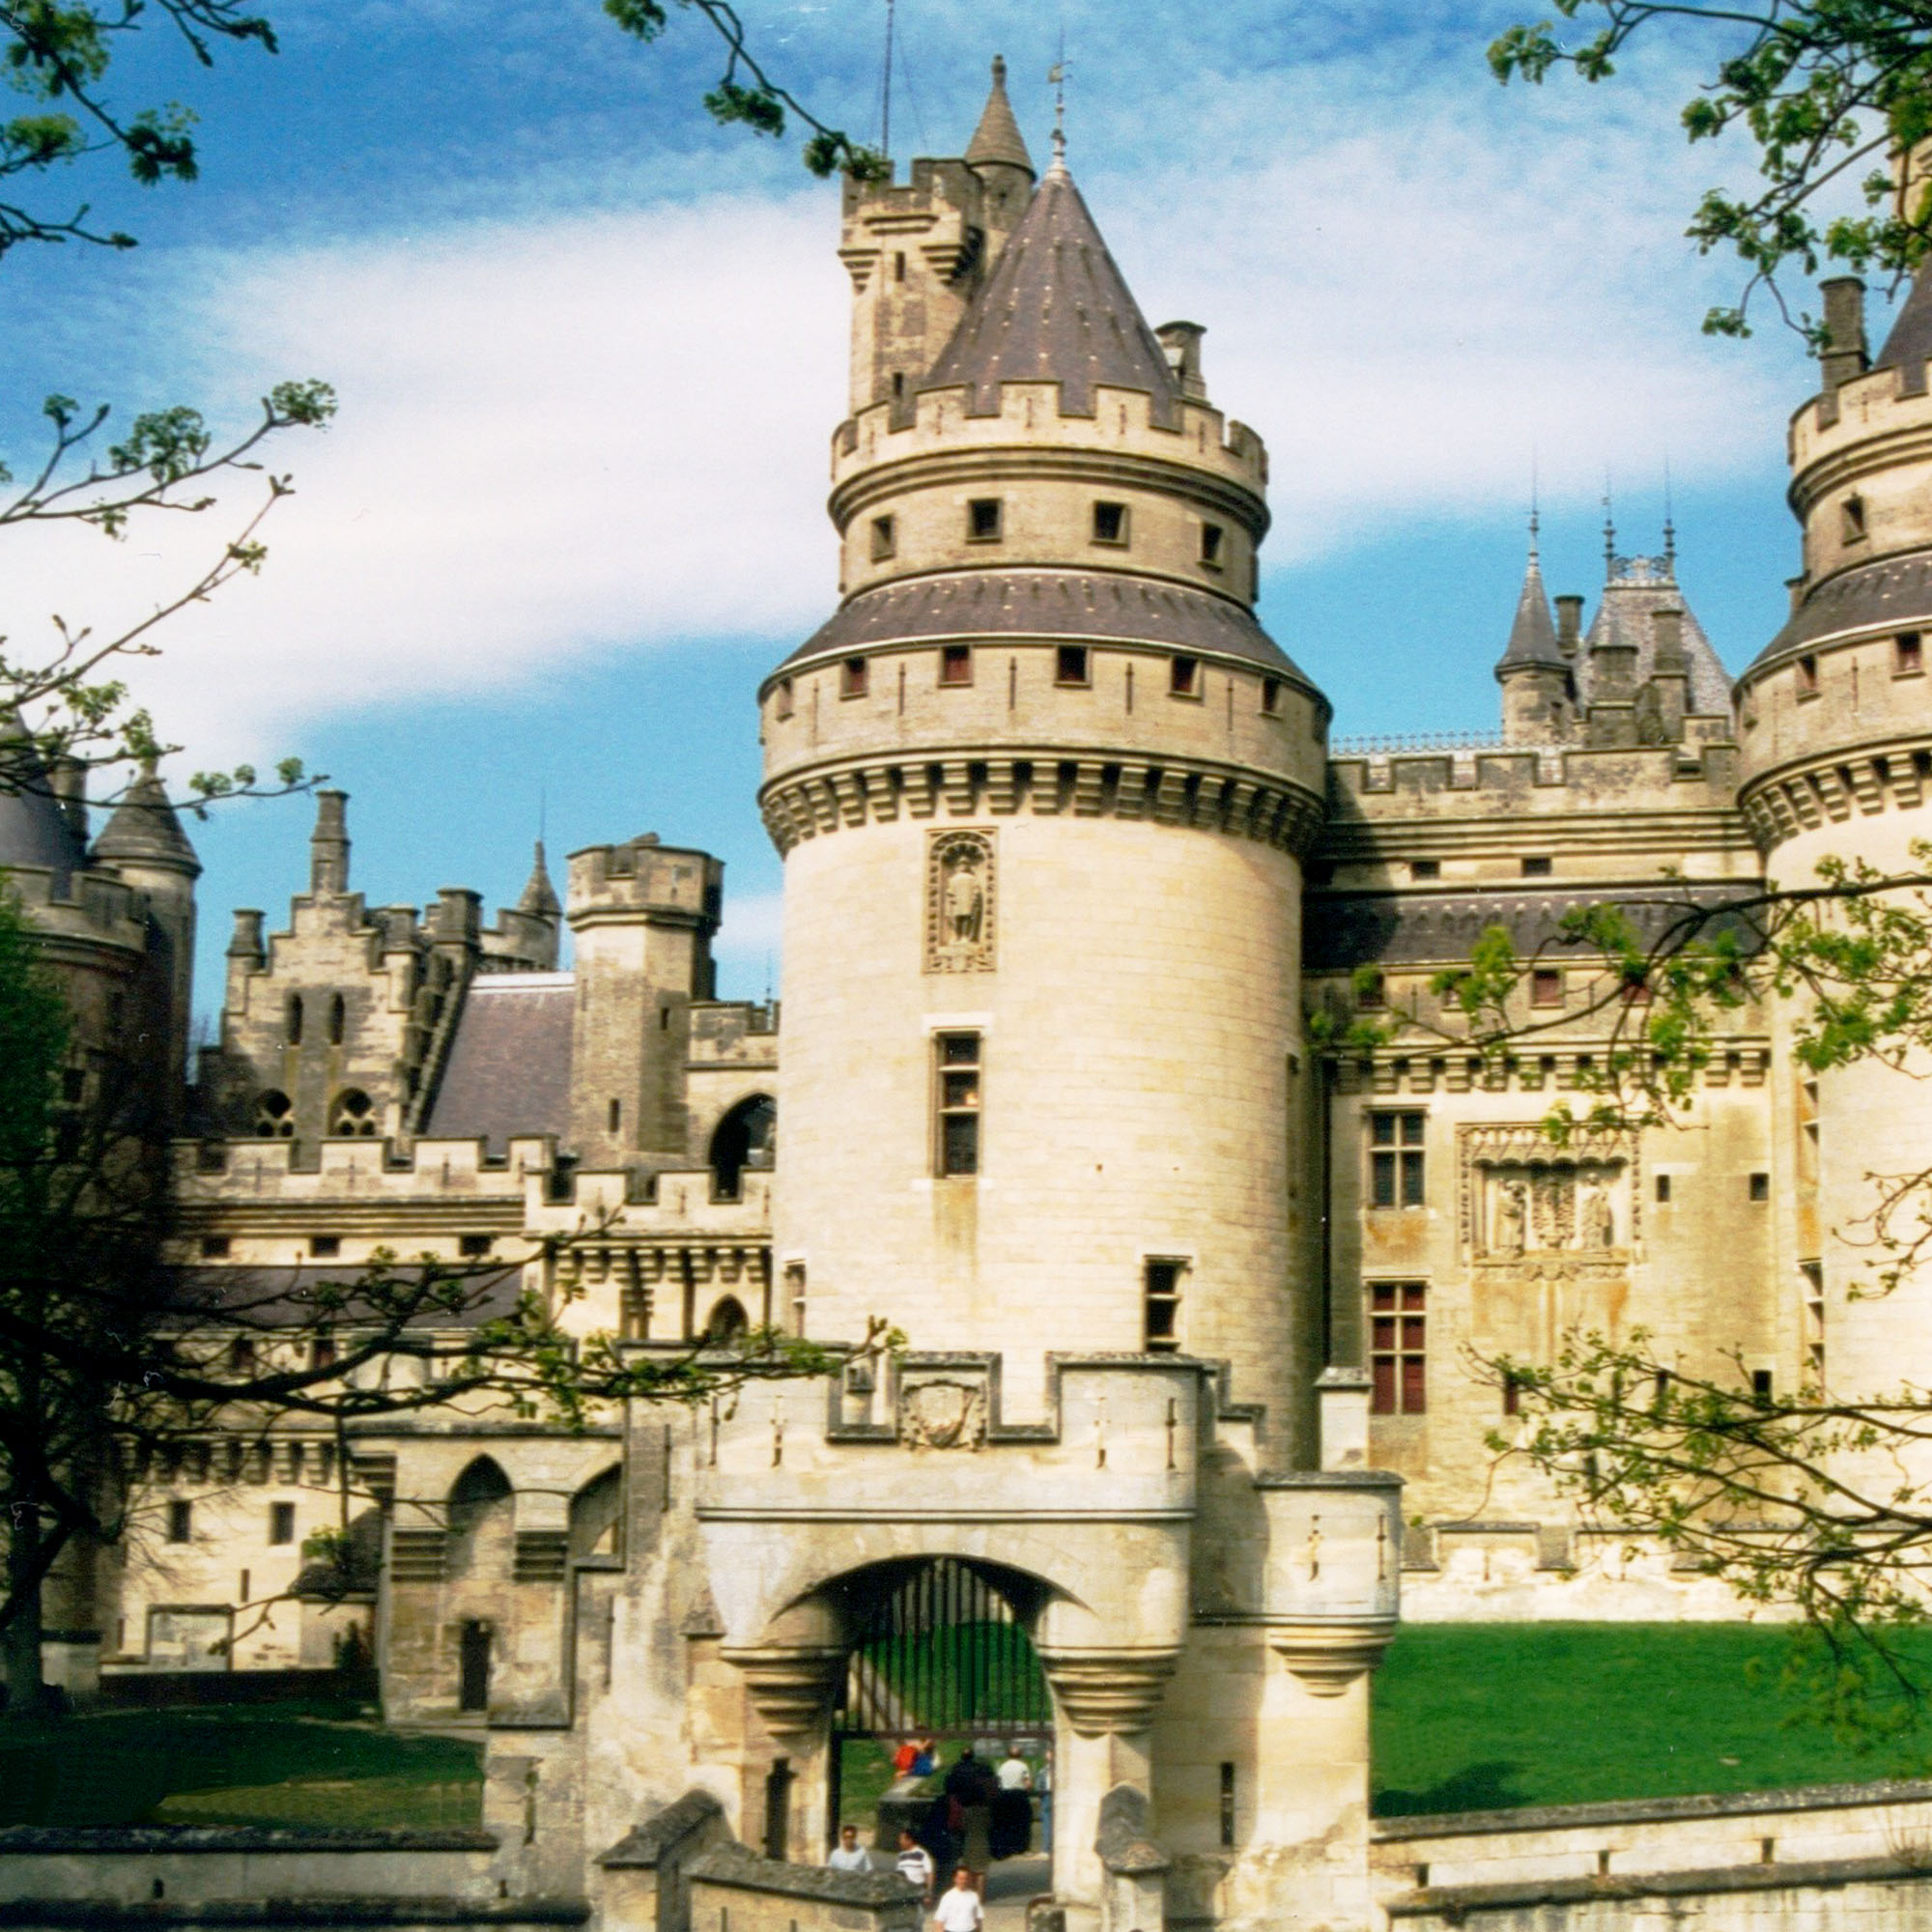 Château_de_Pierrefonds_gîte_saint_germain_oise_versigny